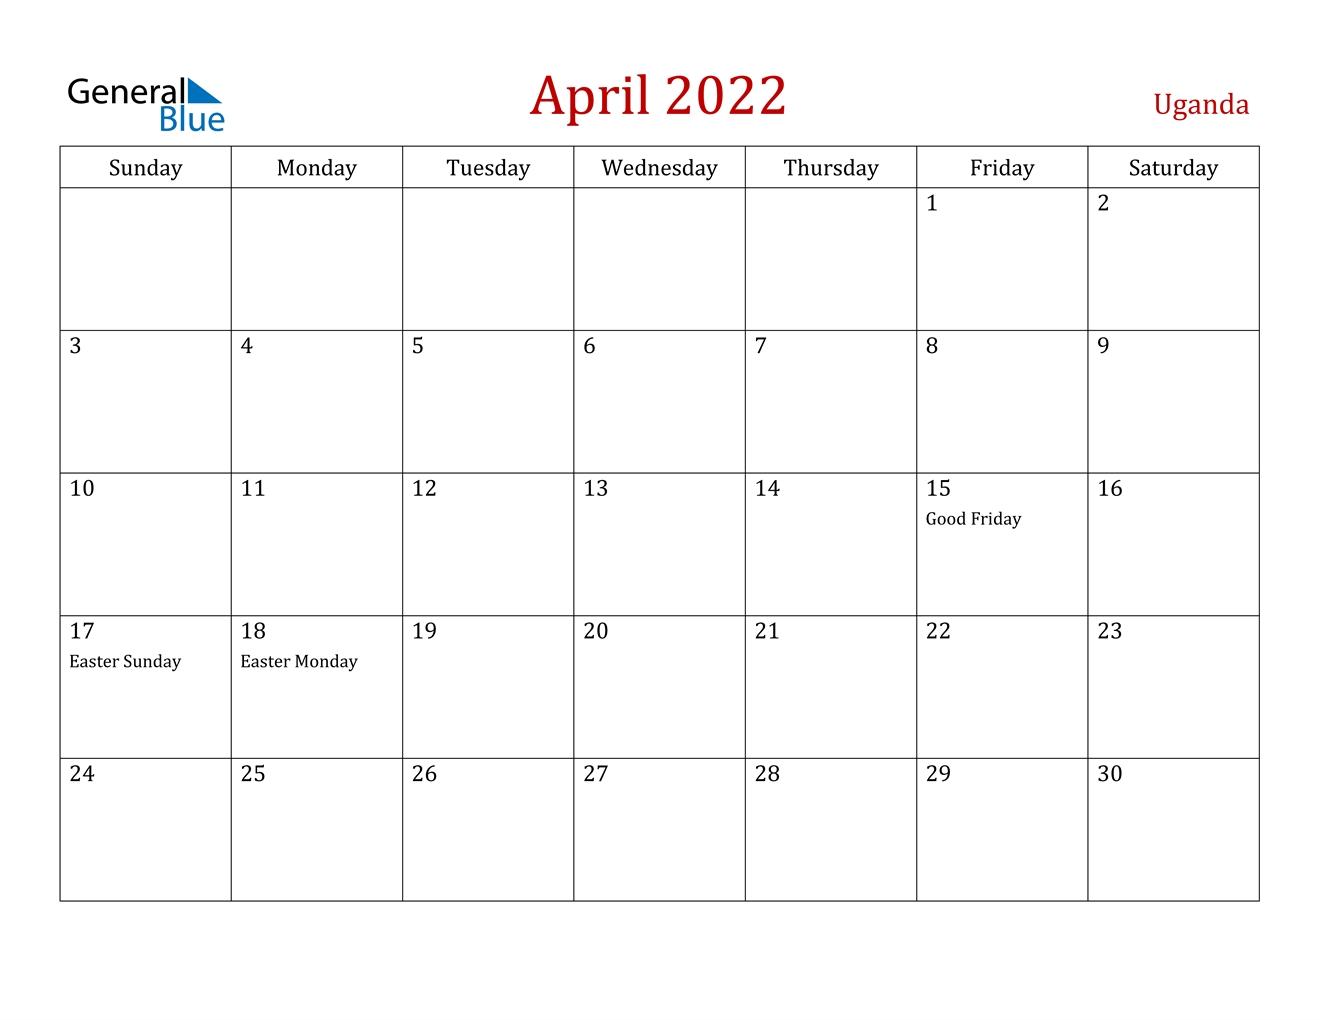 April 2022 Calendar - Uganda